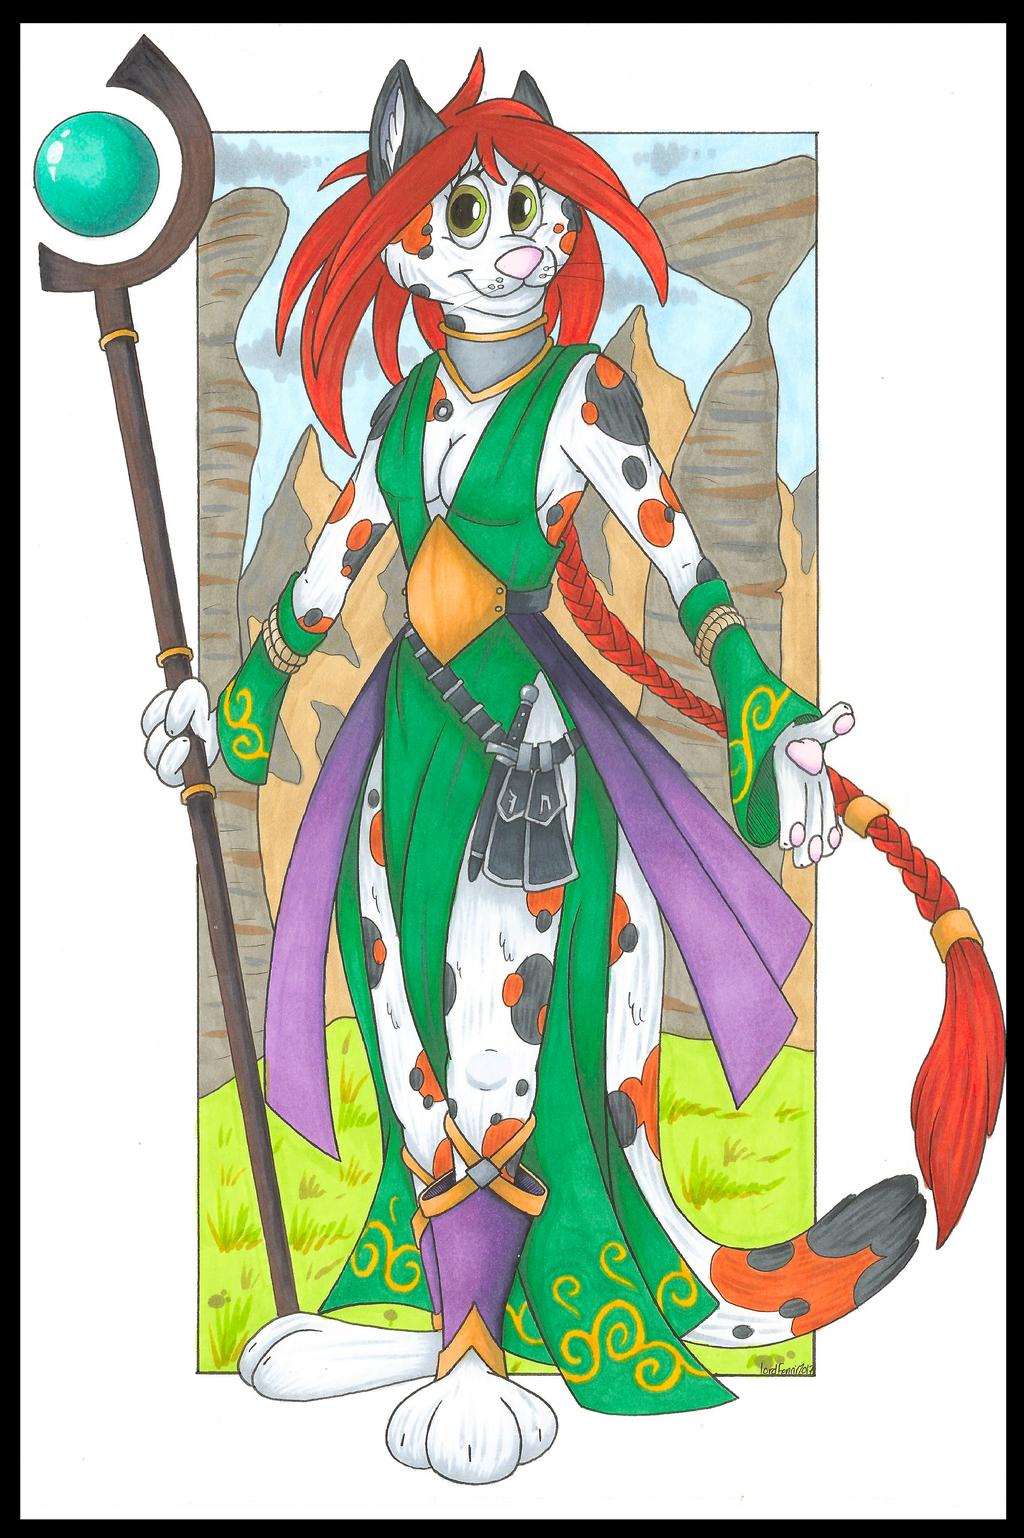 Most recent image: Rosalie, Cat Sorceress